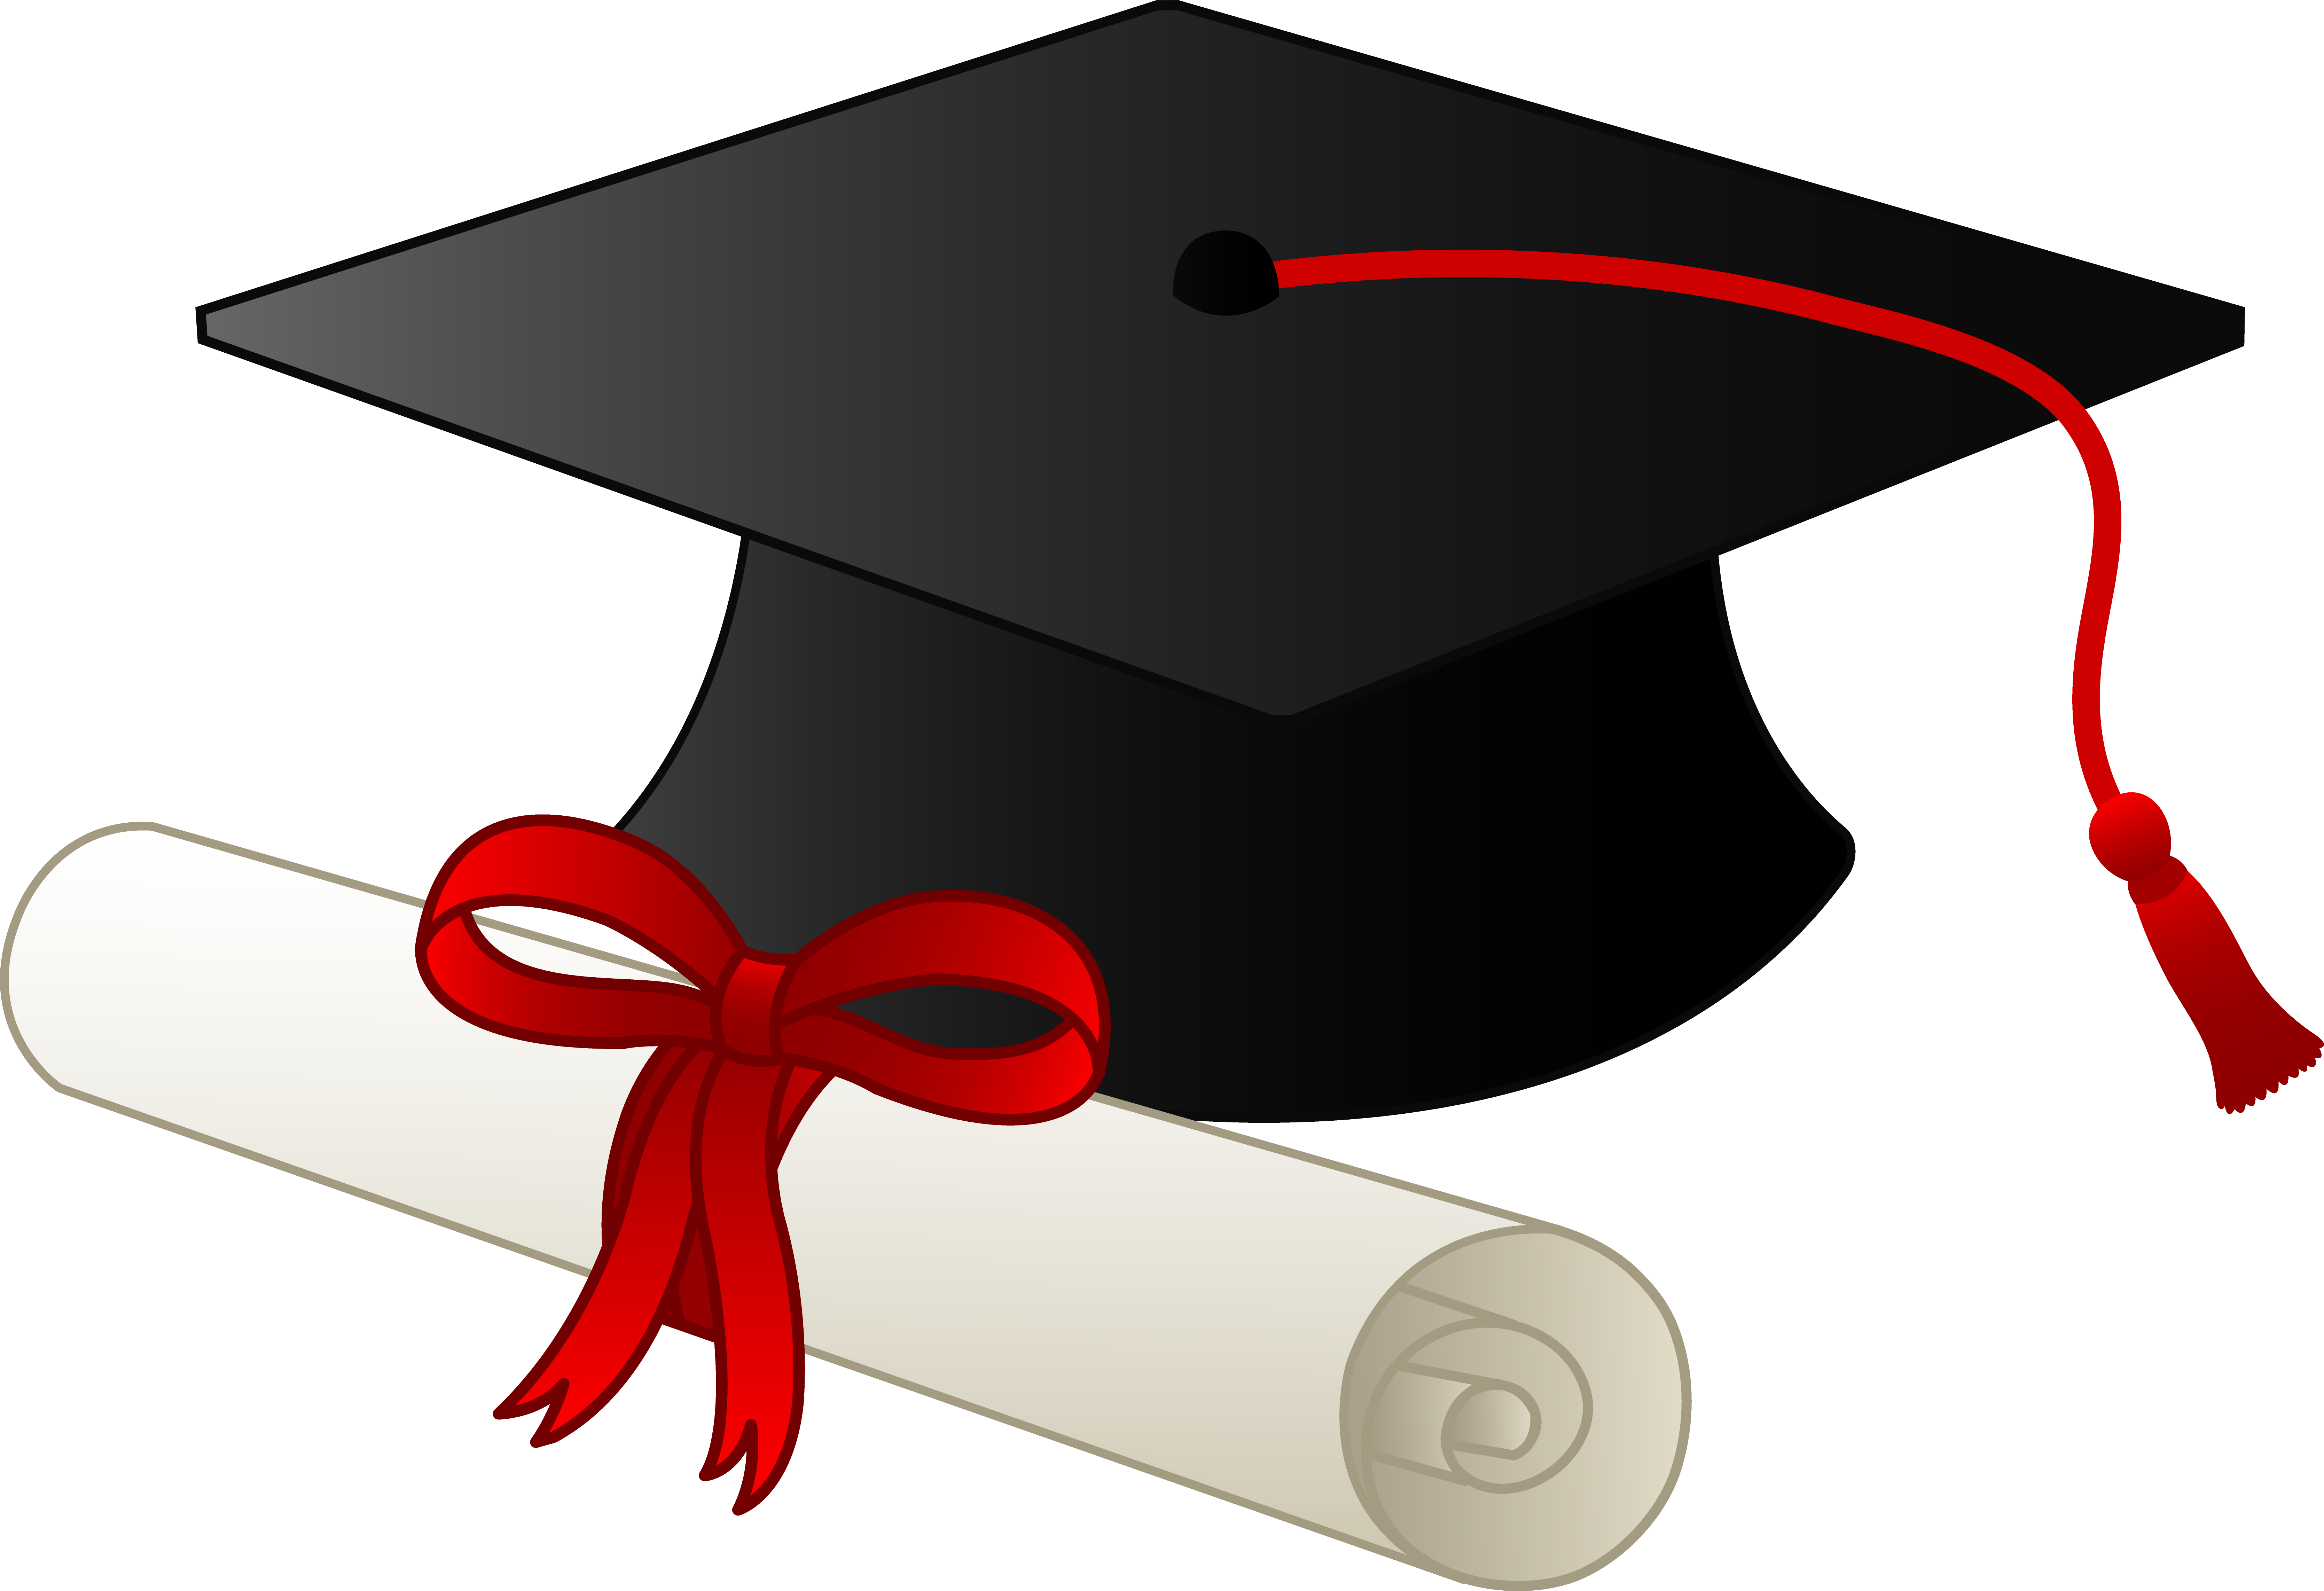 Graduation Cap Clipart on .-Graduation Cap Clipart on .-1